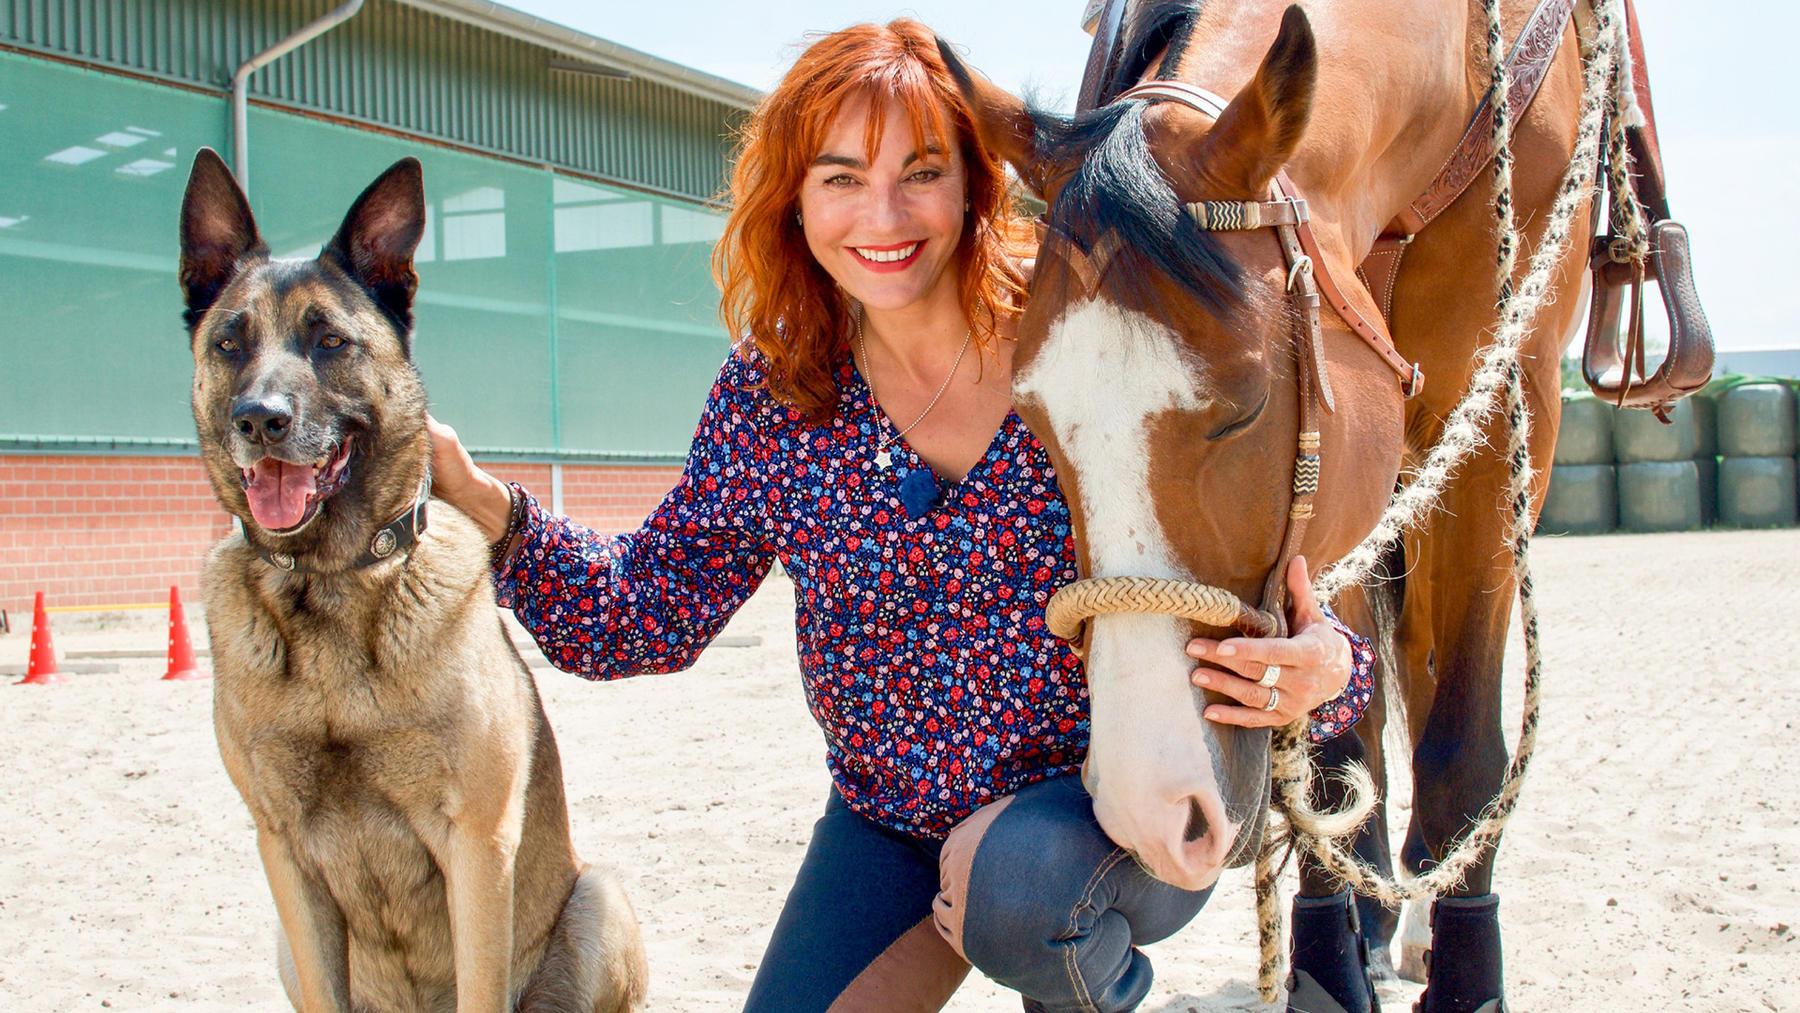 Thema heute u.a.: Horse & Dog Trail